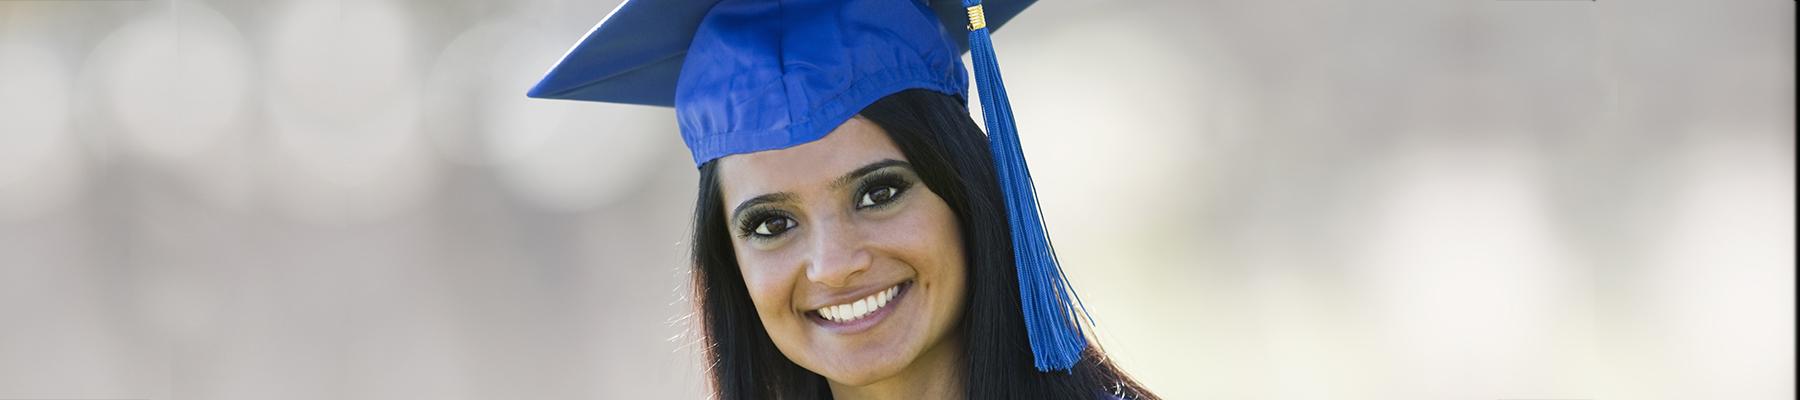 Femal Graduate in cap and gown